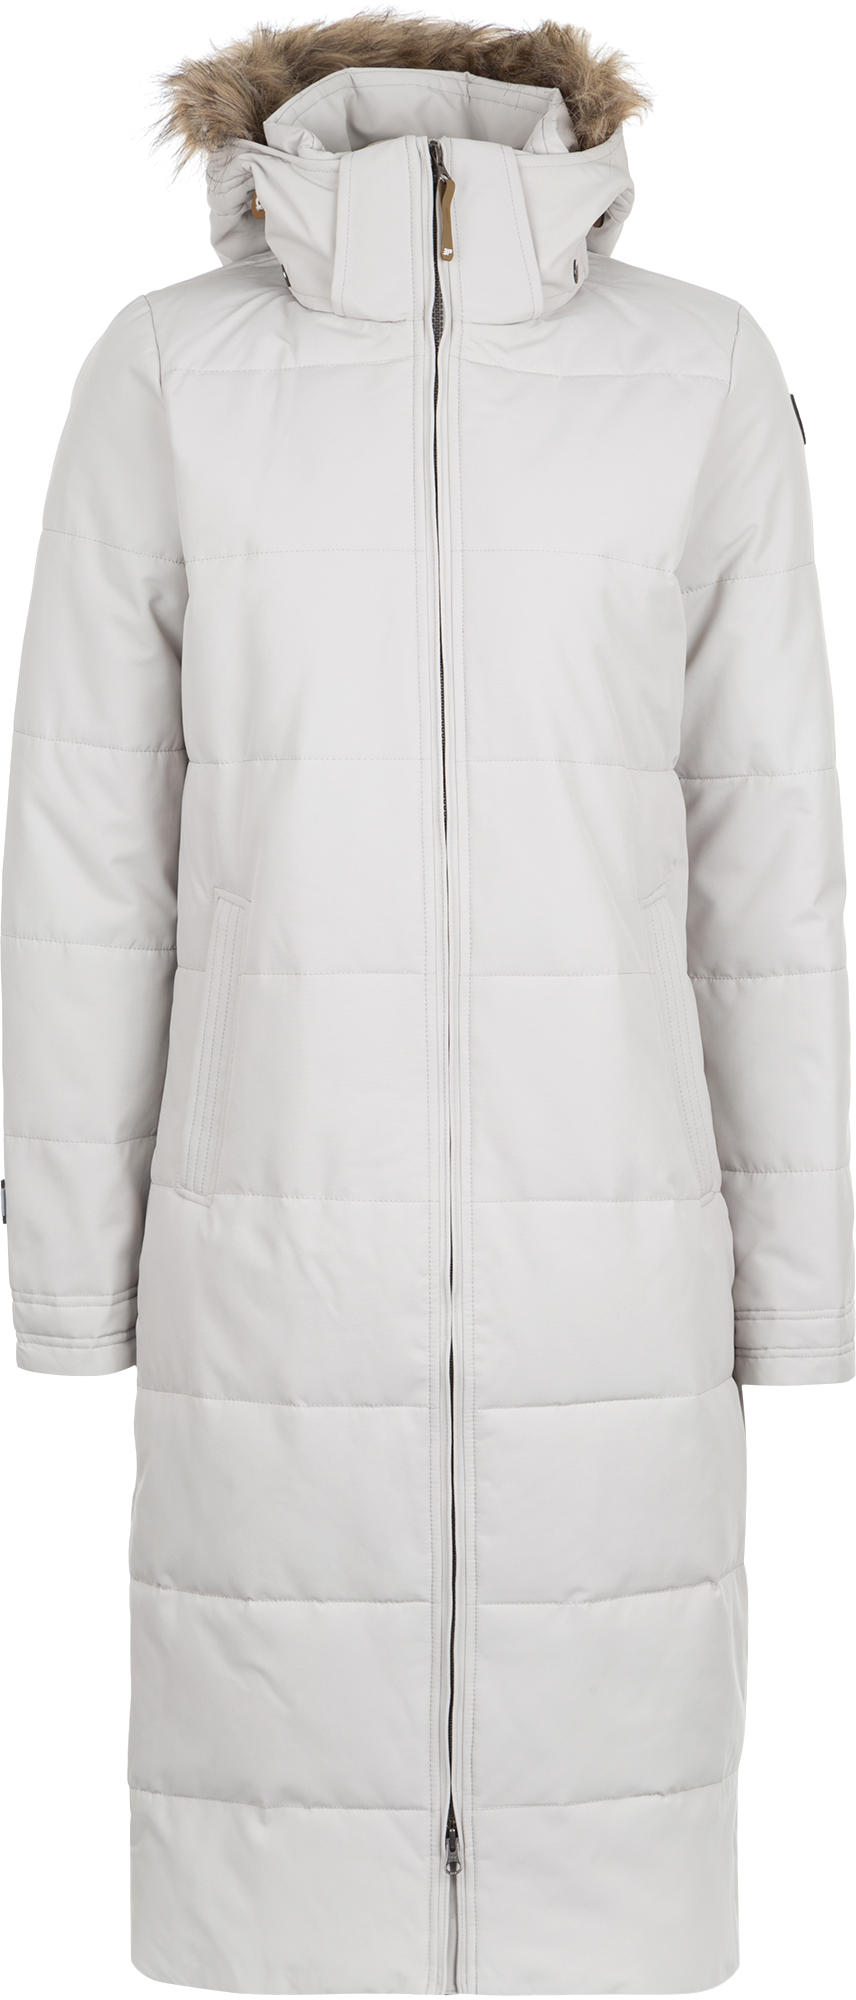 IcePeak Пальто утепленное женское IcePeak Tiina модное утепленное пальто женское